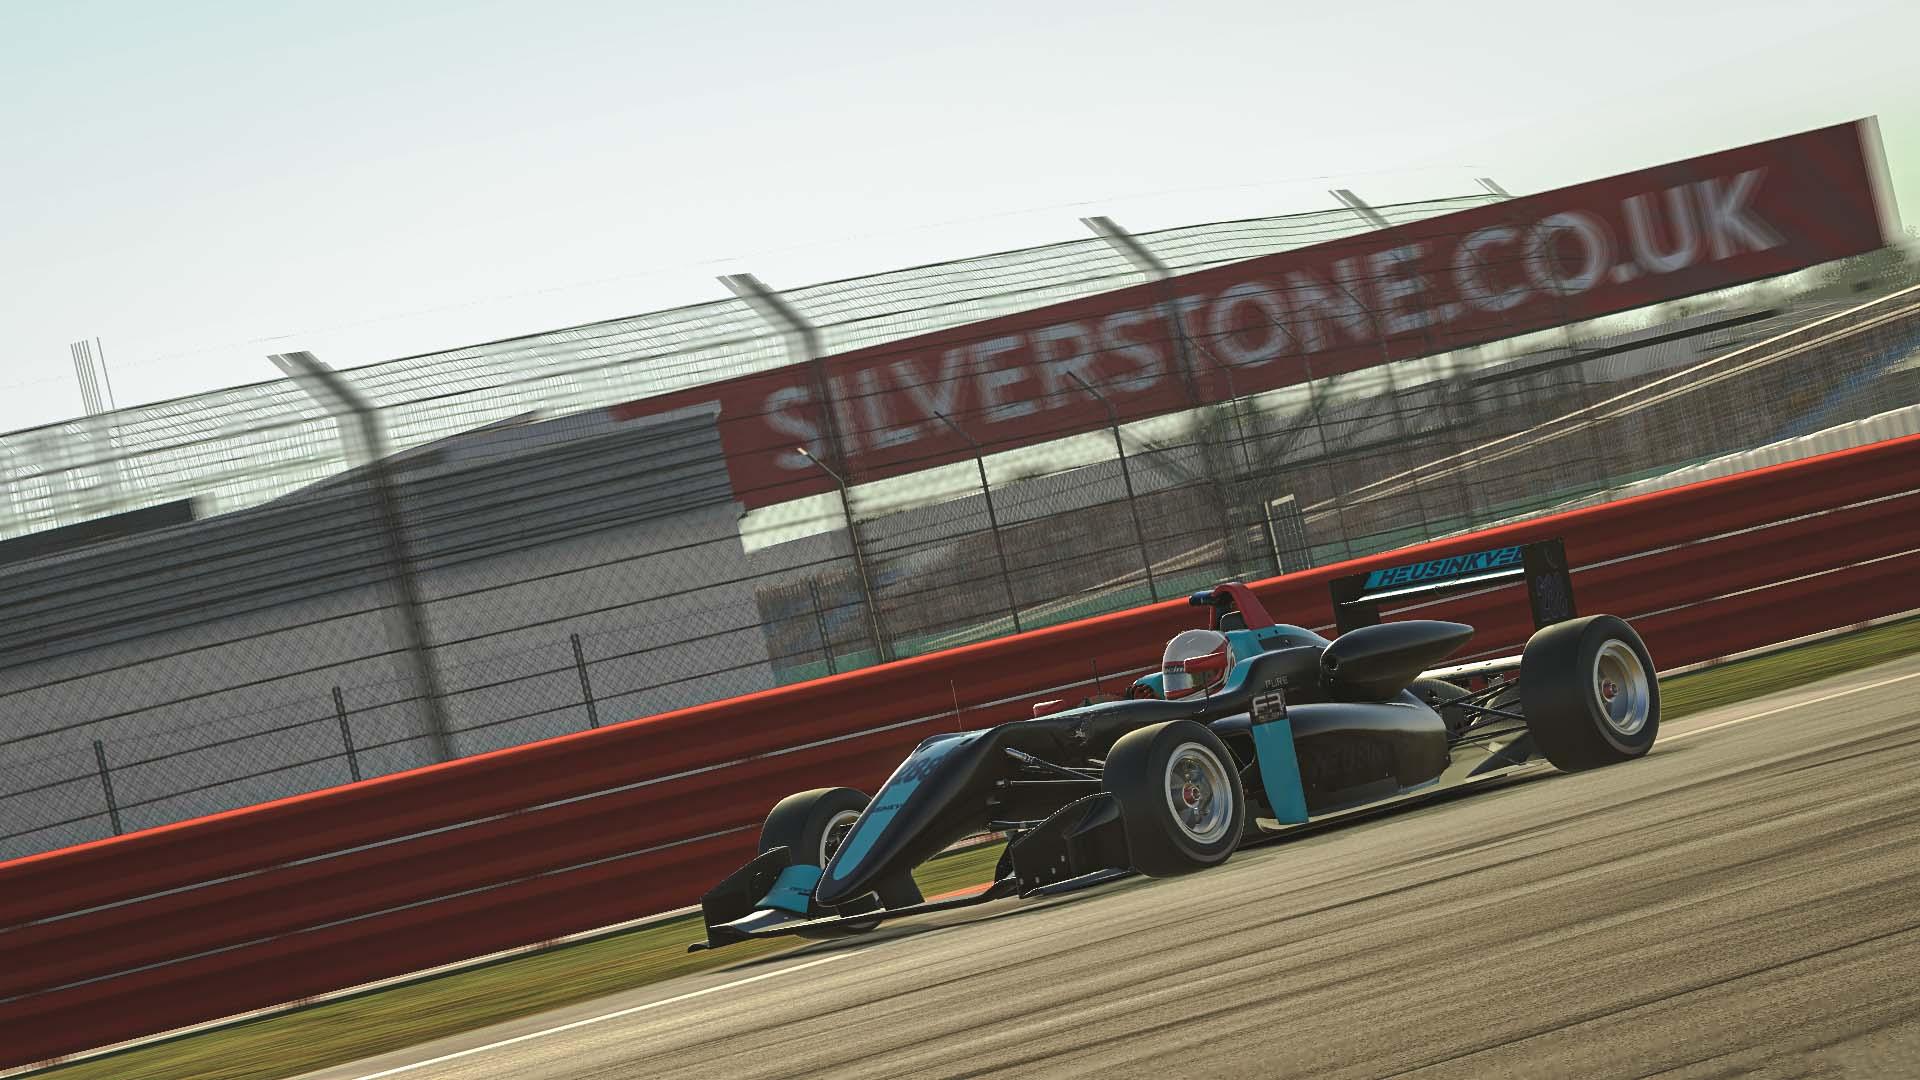 iRacing F3 Silverstone